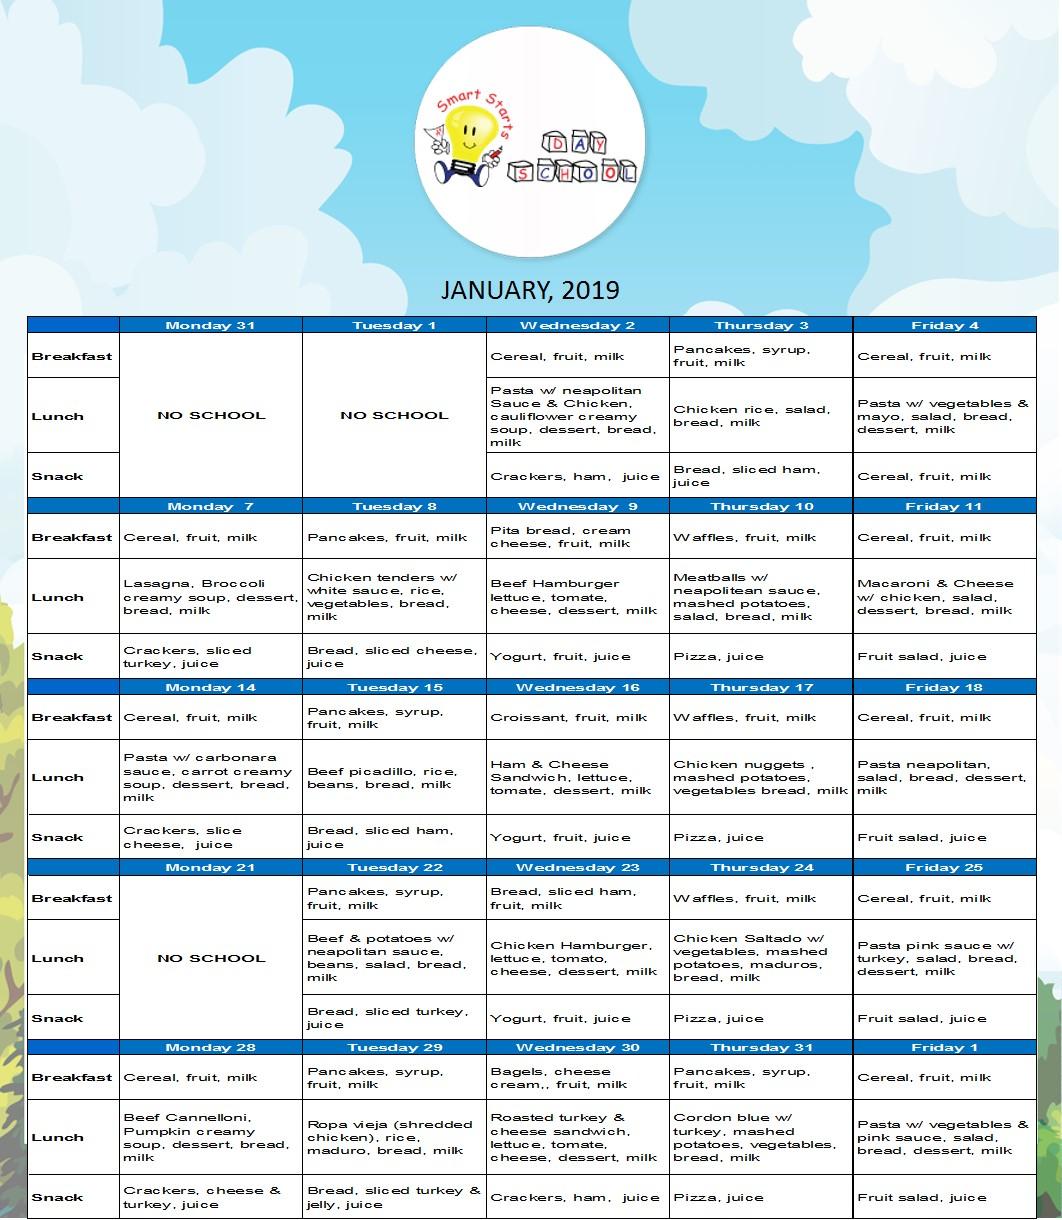 menu-jan-2019-ssds.jpg